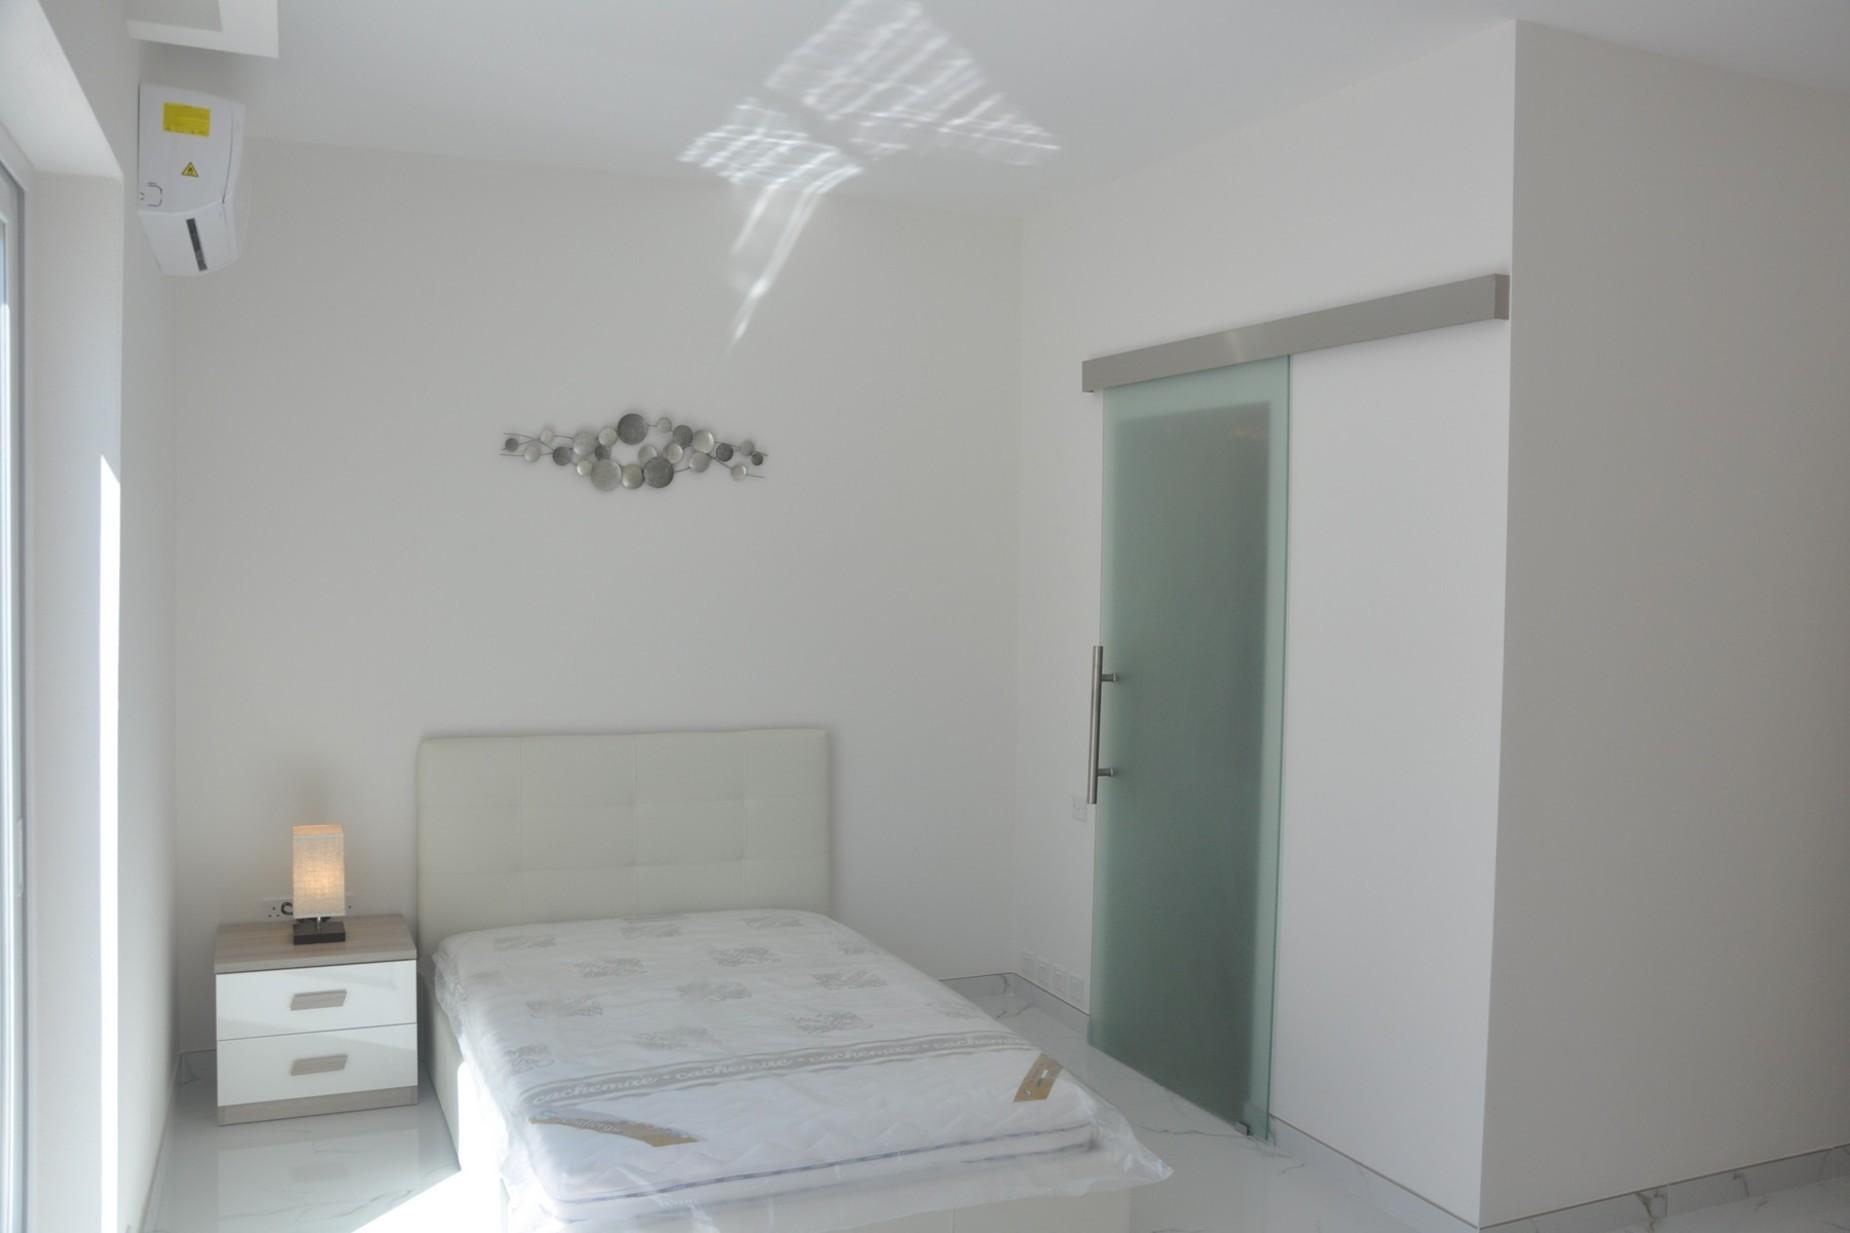 2 bed Penthouse For Sale in Kalkara, Kalkara - thumb 16